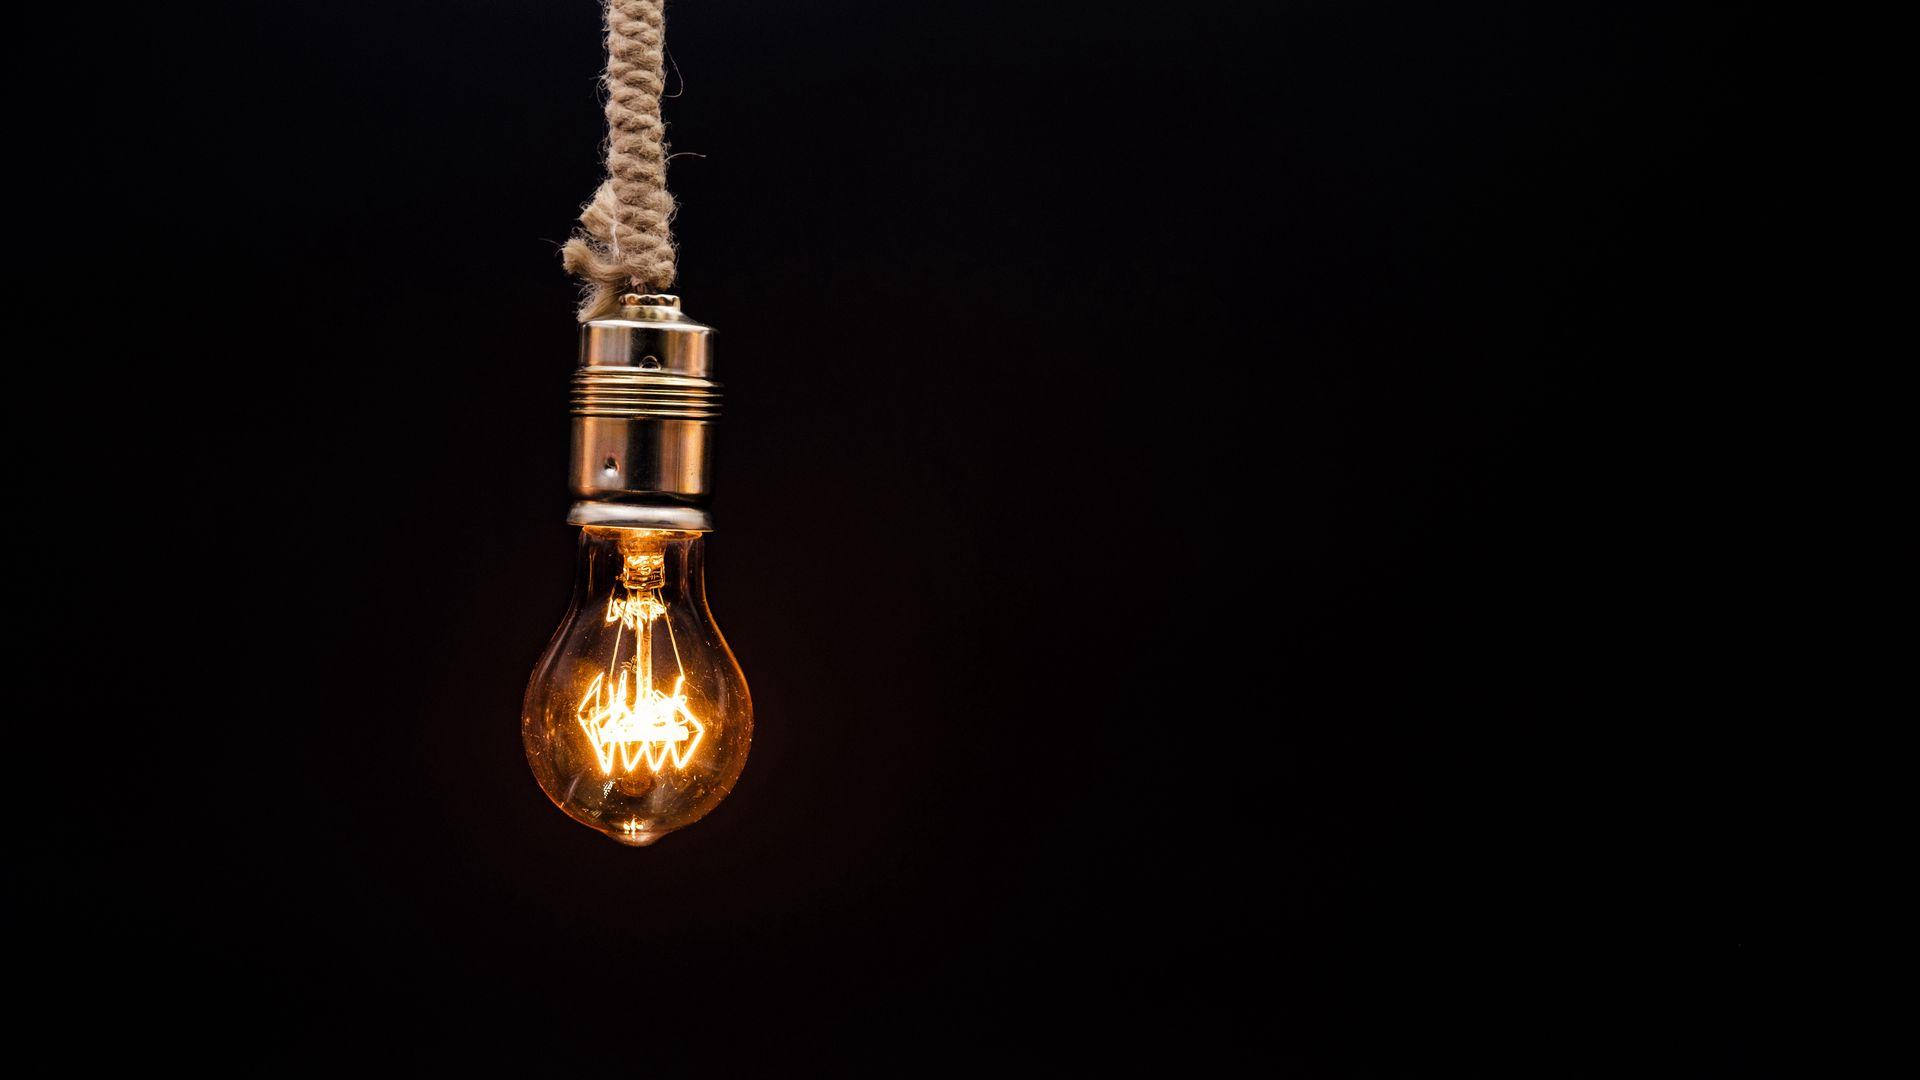 1920x1080 Wallpaper bulb, lighting, rope, electricity, edisons lamp